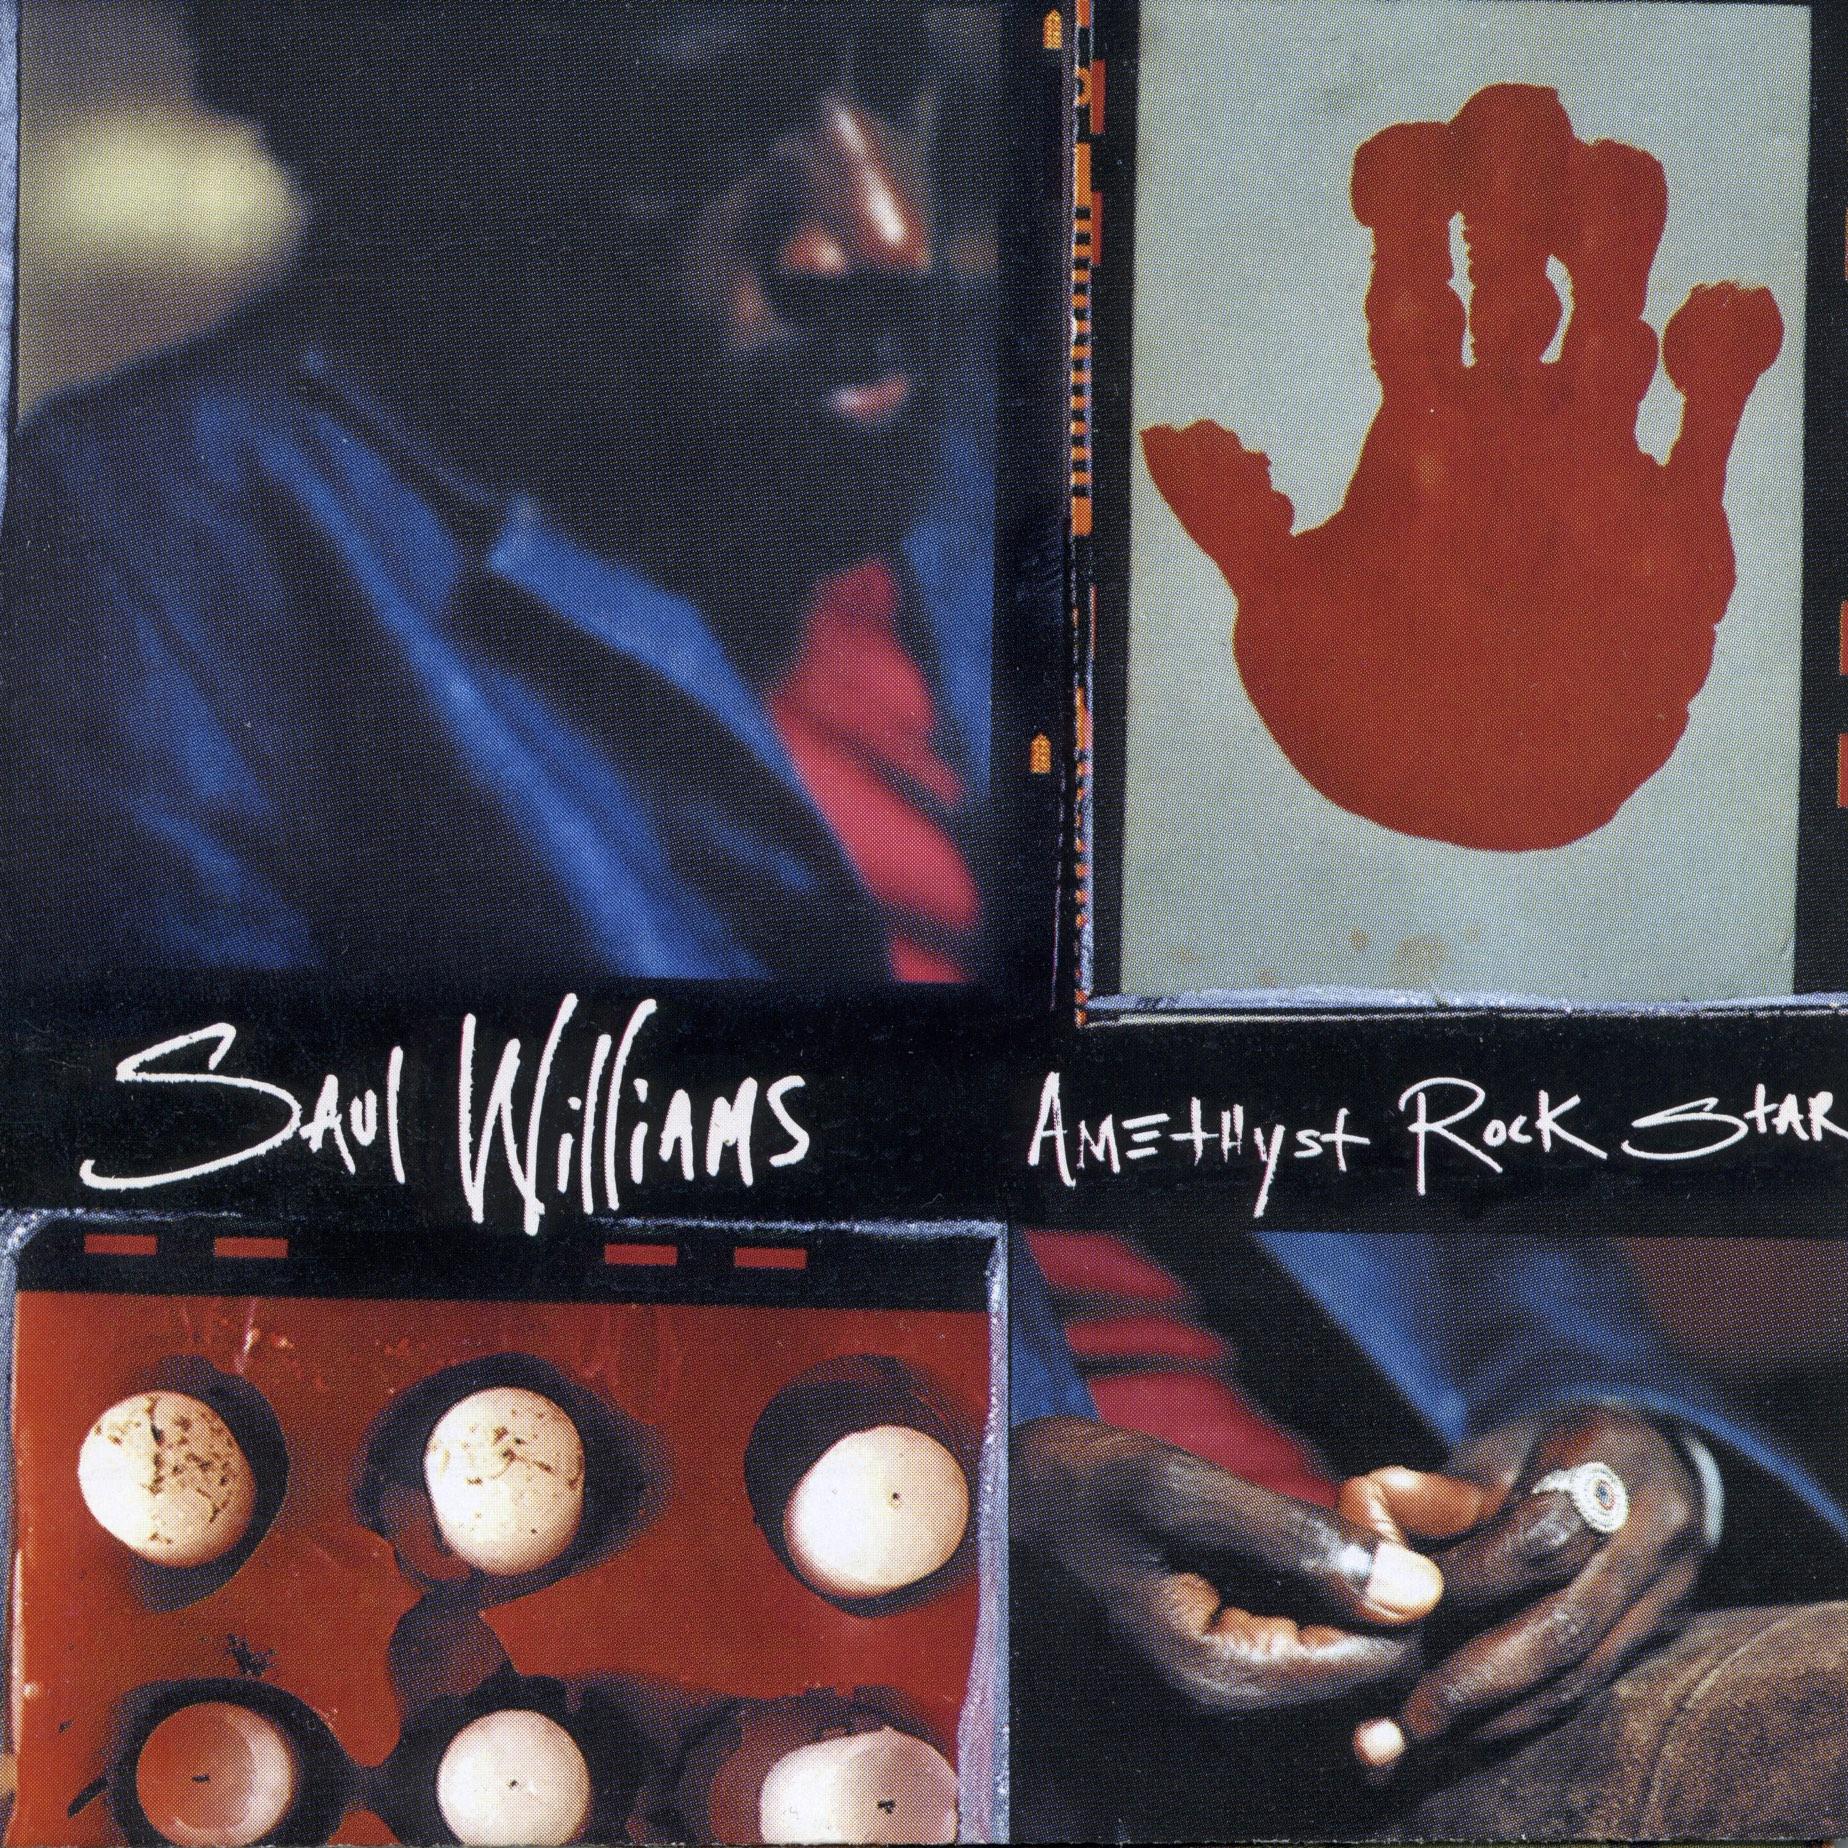 2000 - Saul Willams